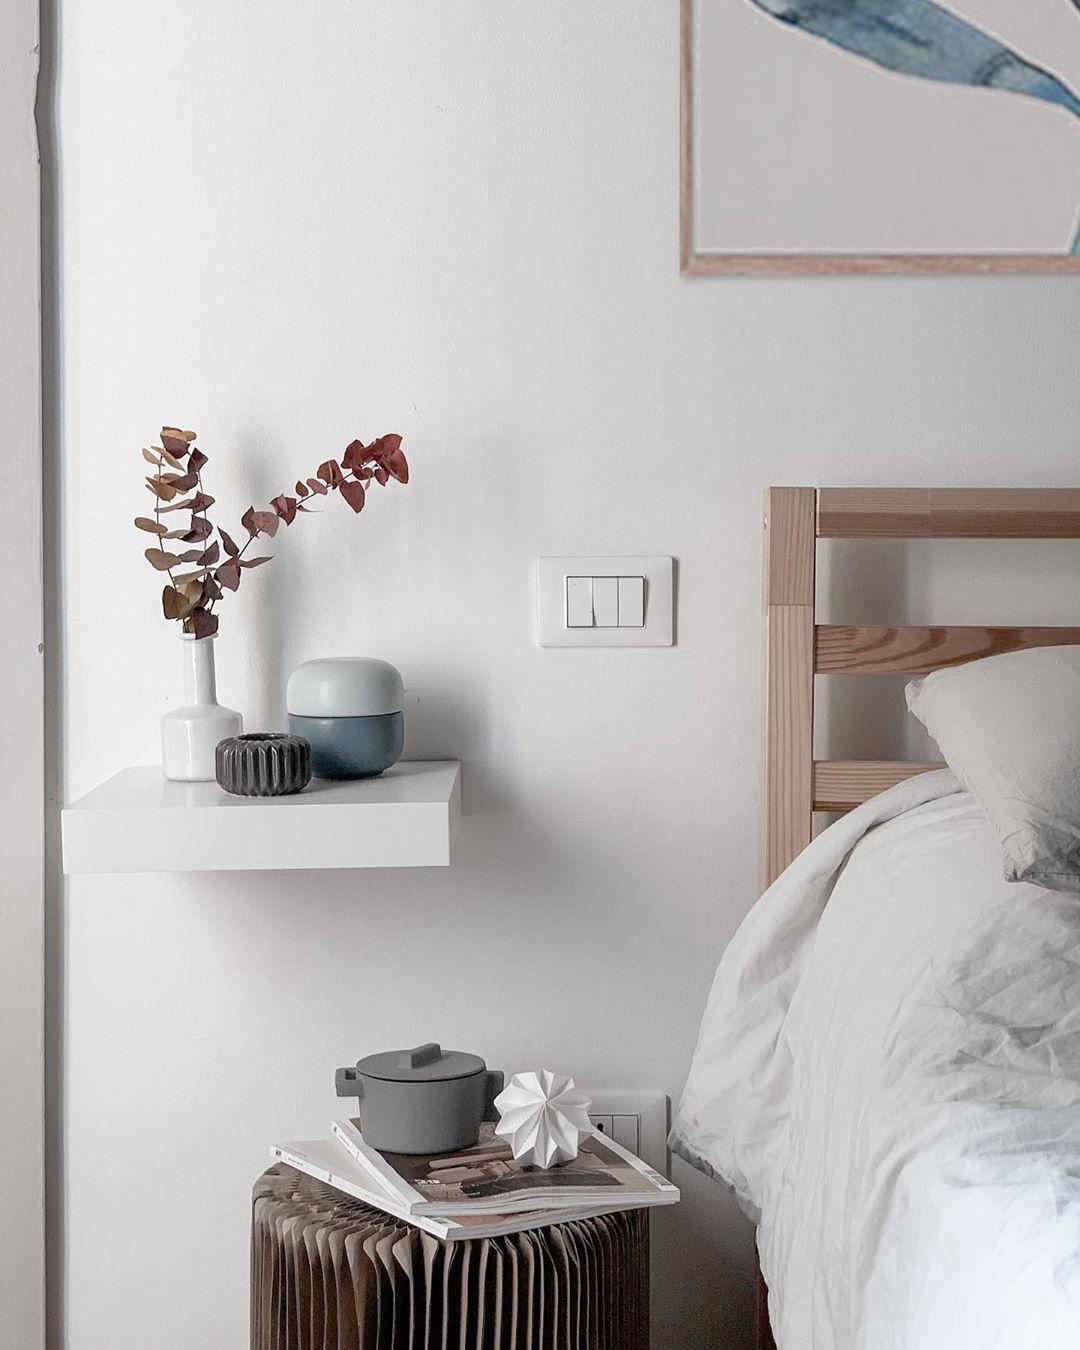 "Simona Ortolan on Instagram: ""Another prospective . . . . #ilpampanohome #casafacile #casafacilestyle #interiordesign #homedesign #nordicdesign #interiorinspiration…"""